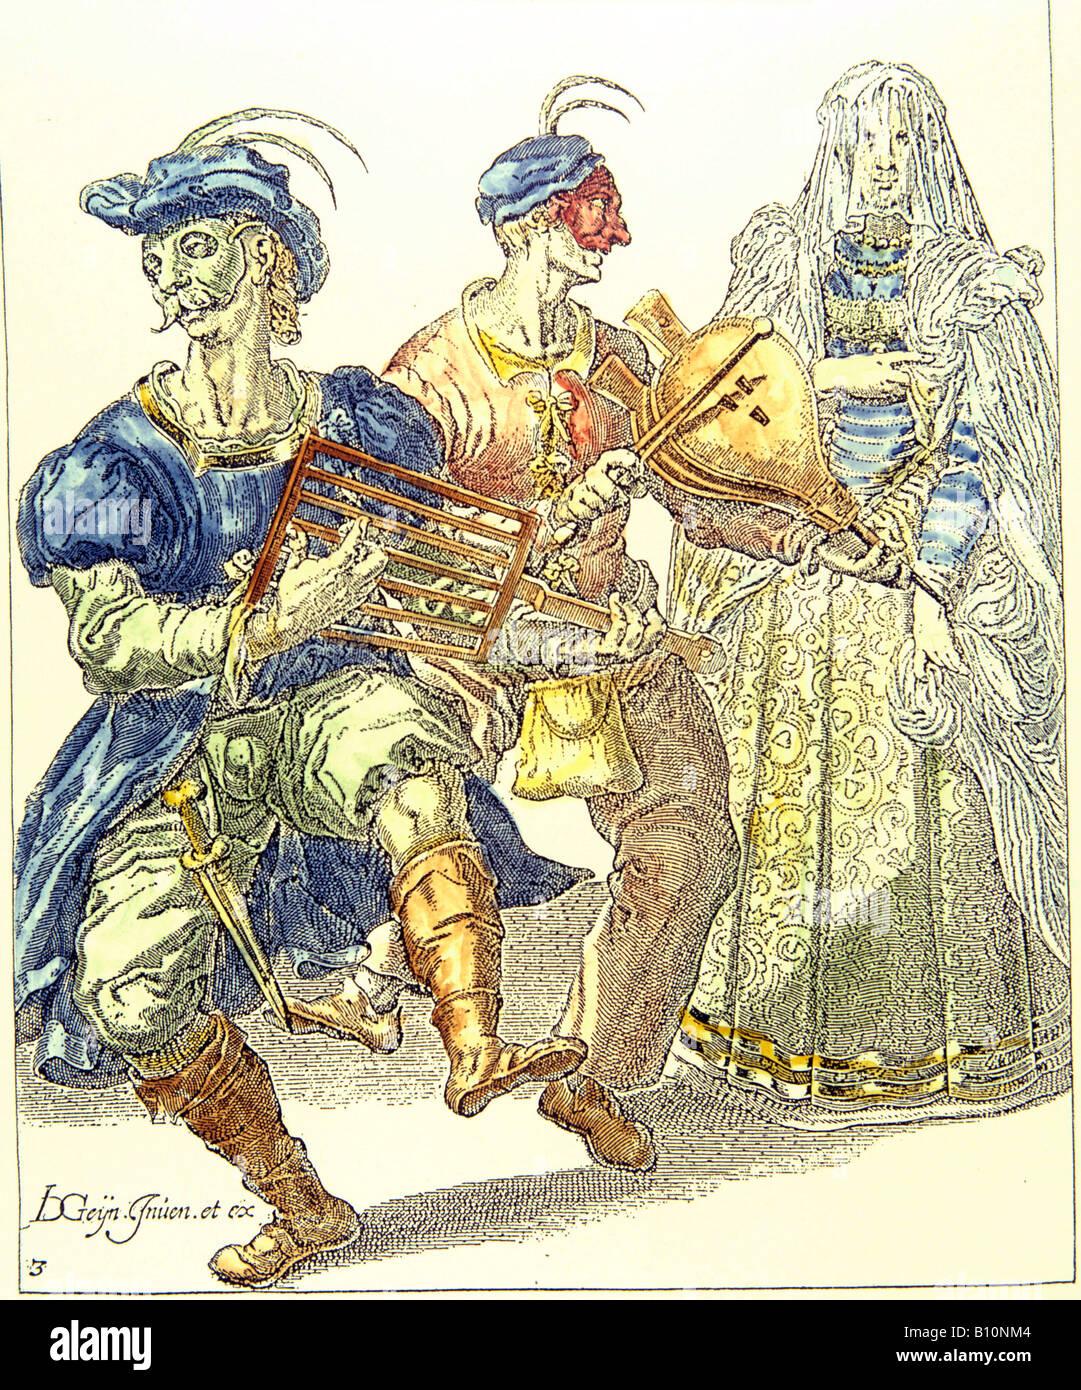 Venetian Masquerade dancient in costume 17th cent  Copyright Ancient Art Architecture Collection Ltd Stock Photo